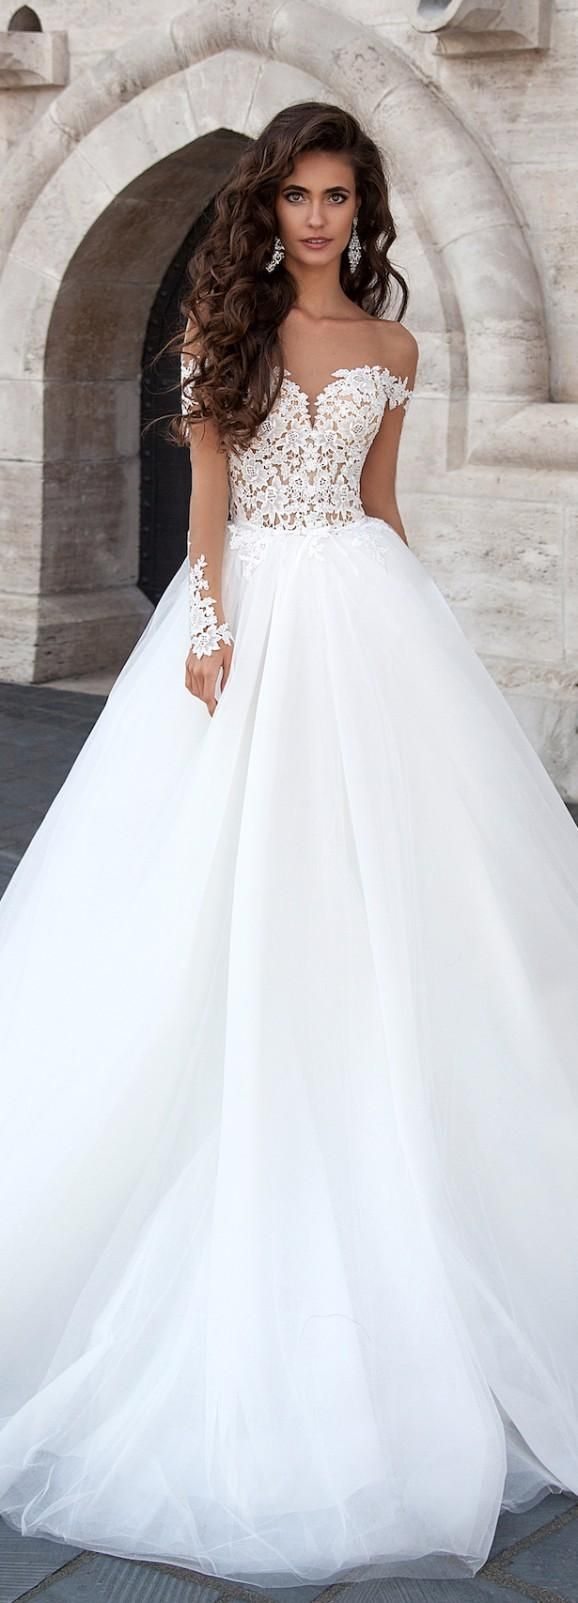 Milla Nova - wedding dress collection